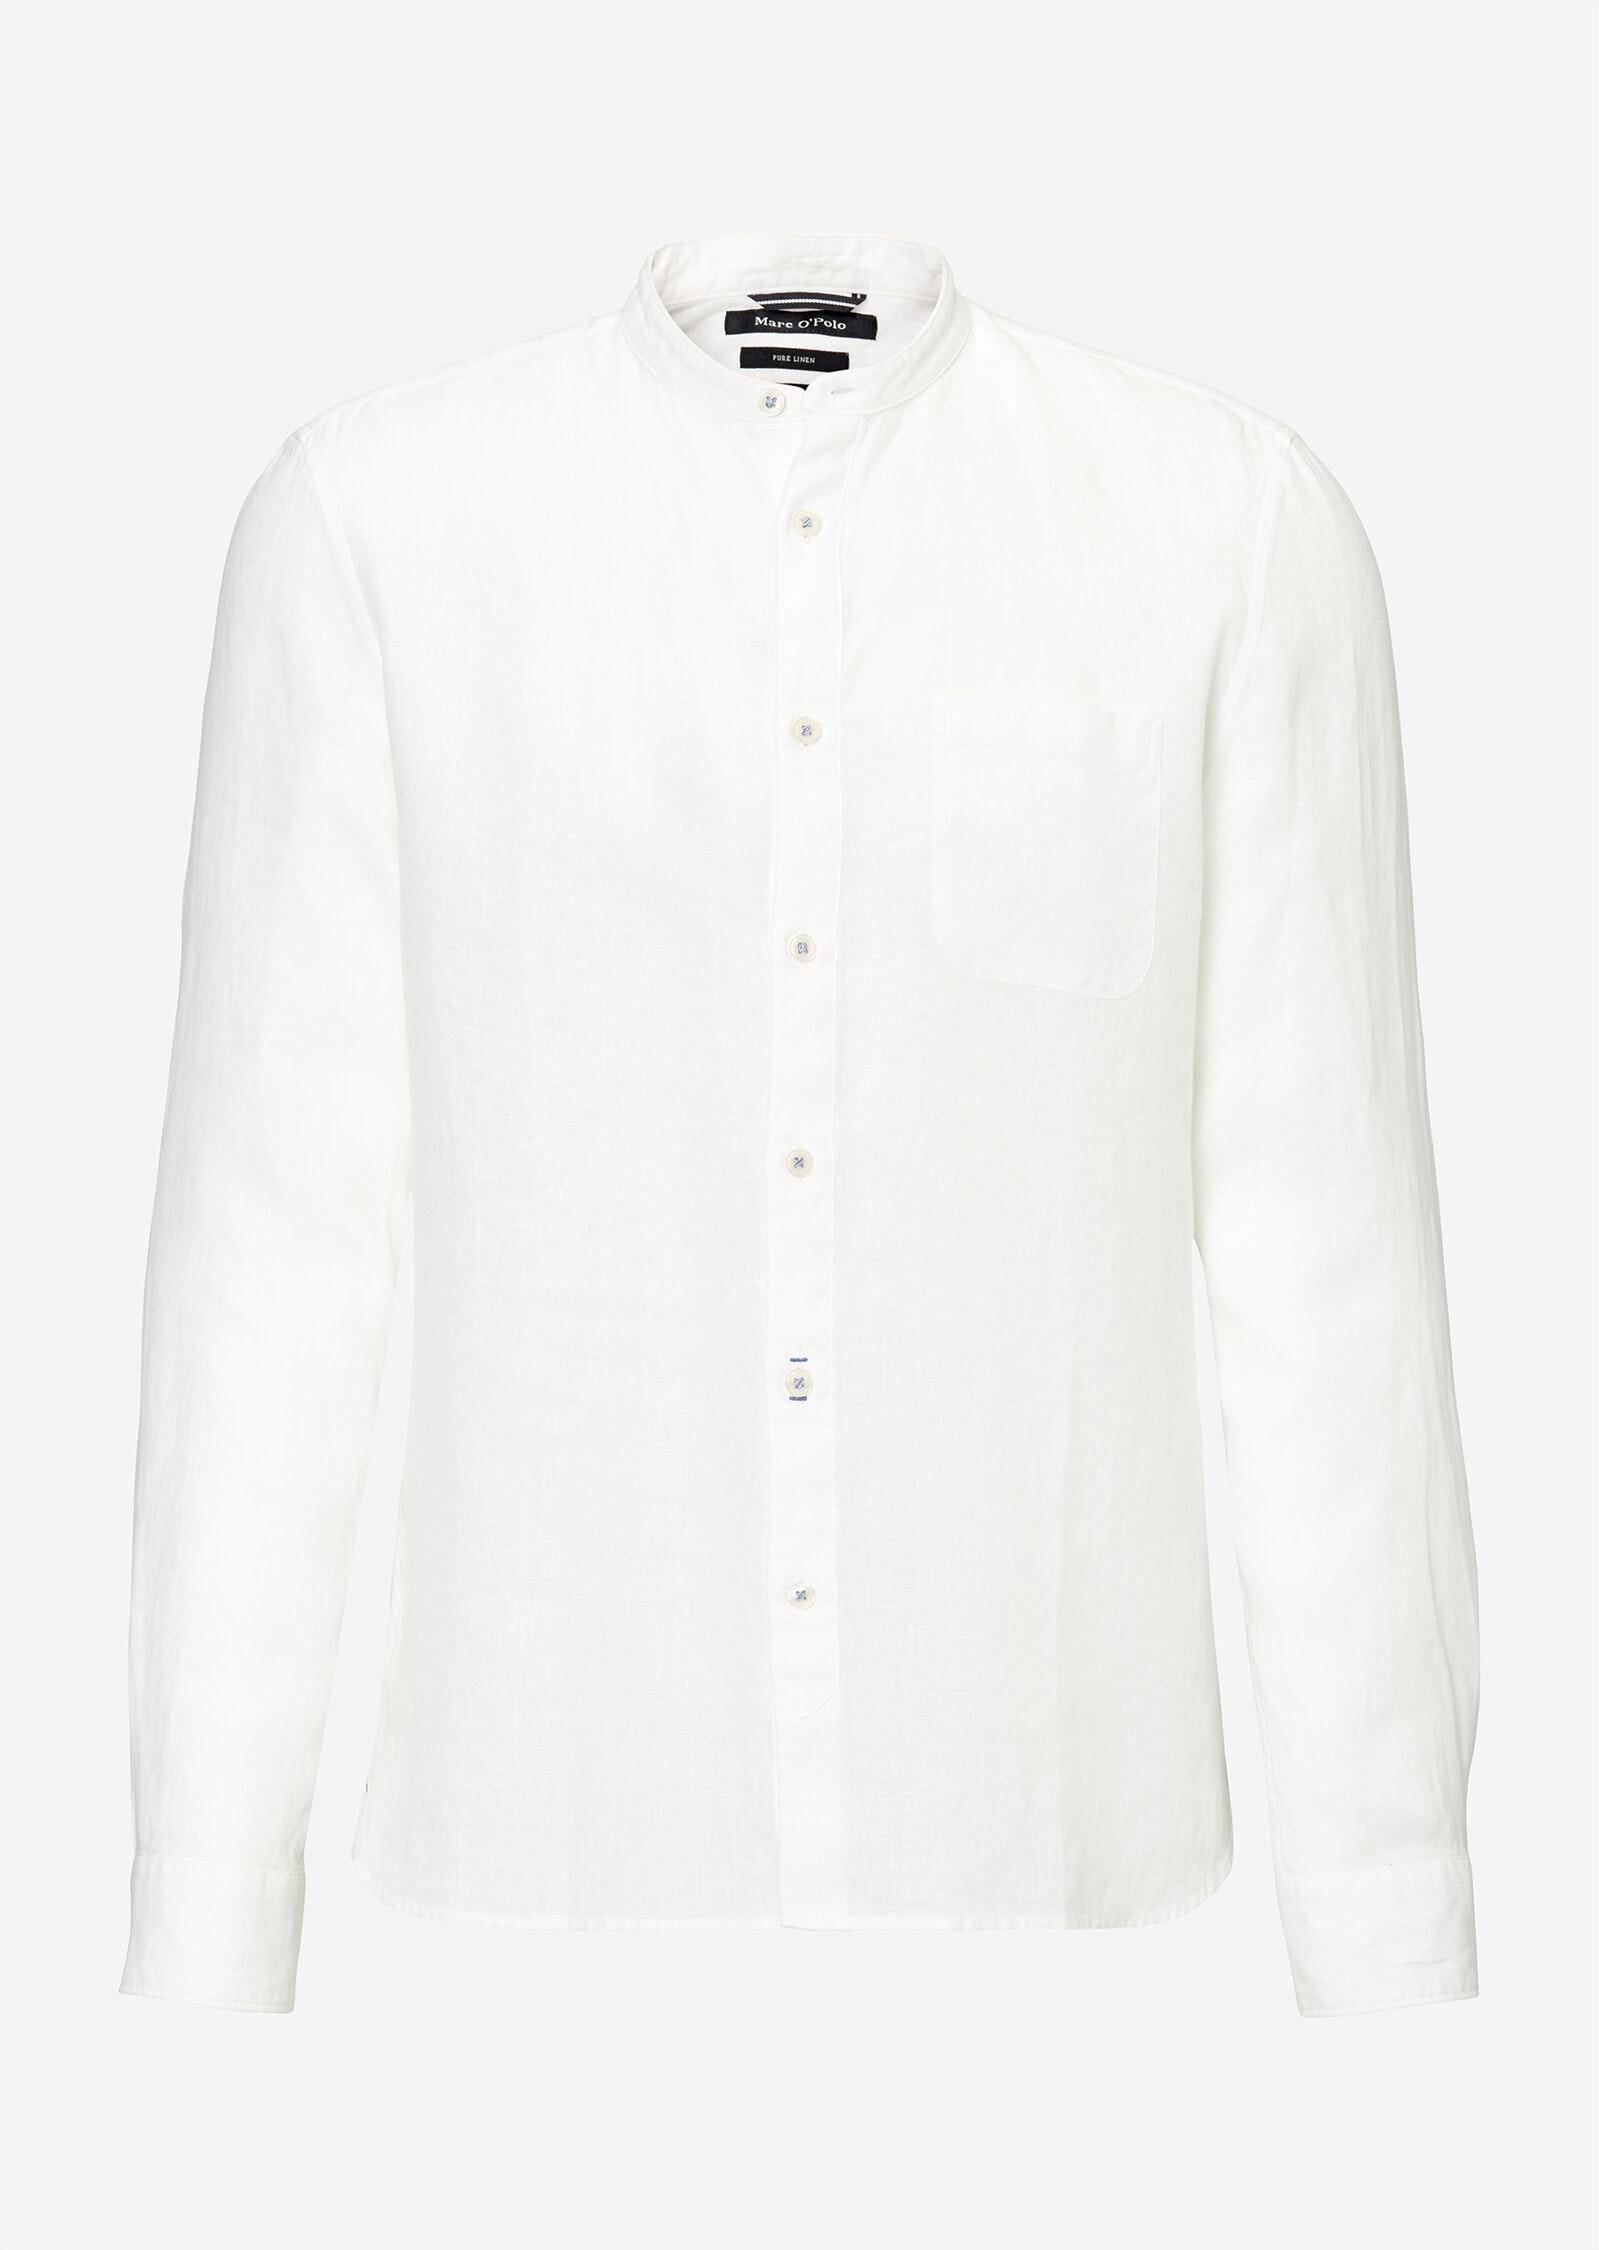 Band collar,long sleeve,one pocket,